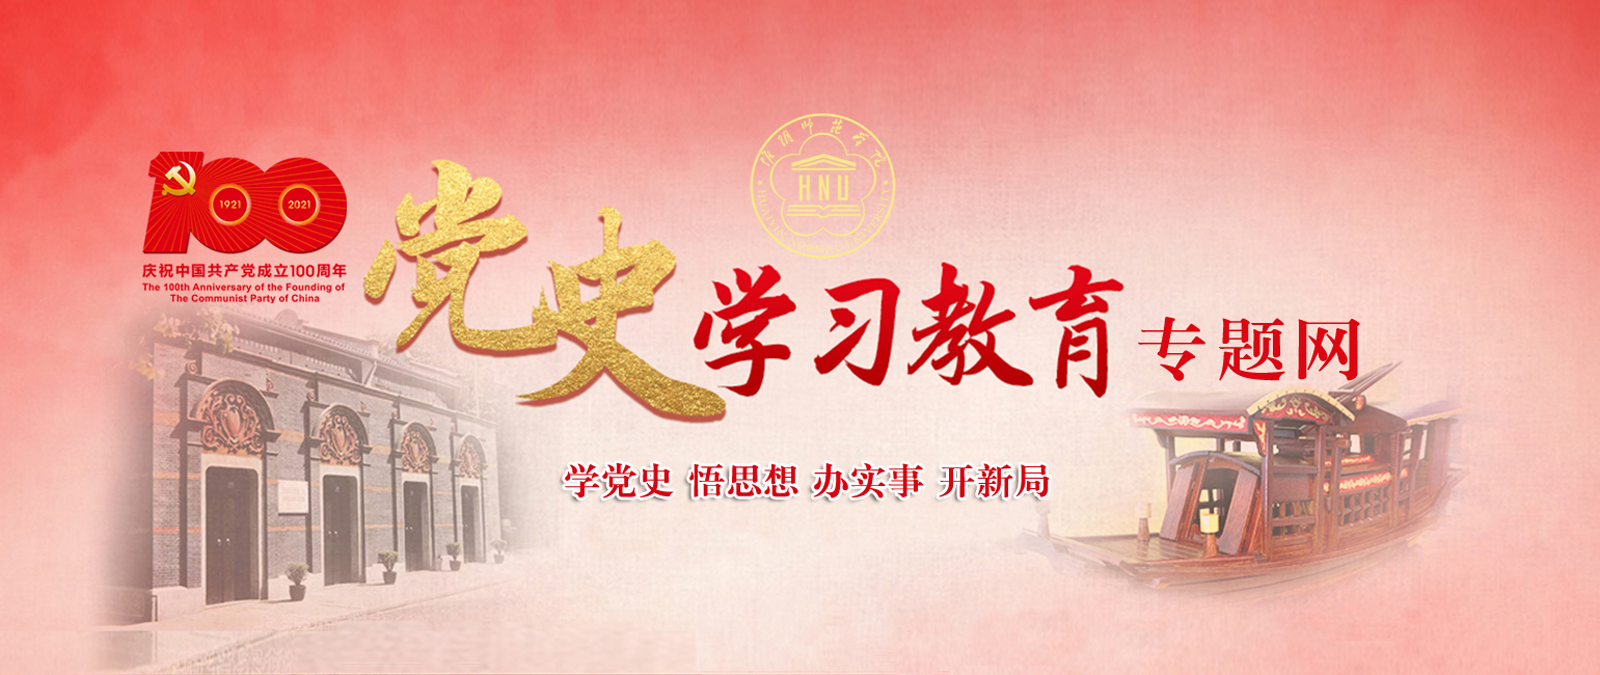 黨cheng)費(fei) 敖(ao)逃ㄌ饌></a></li><li data-title=